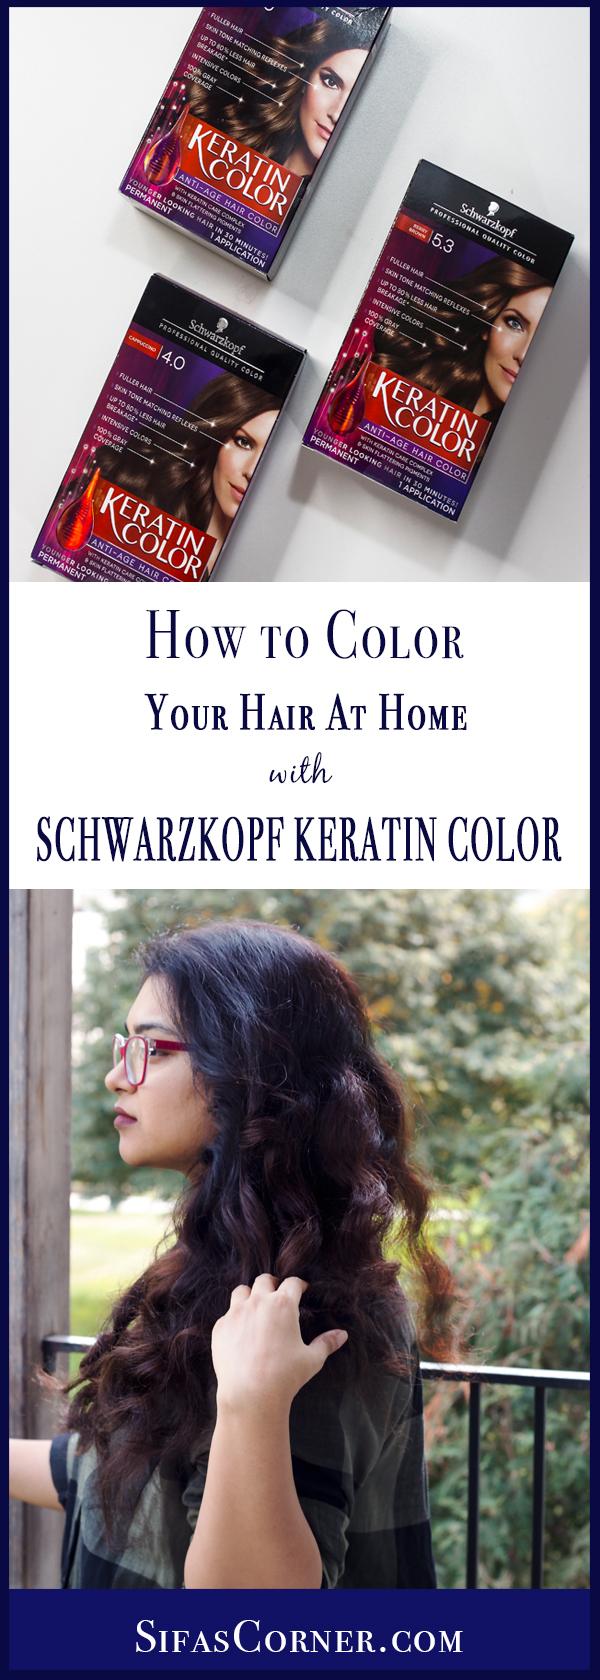 howto Schwarzkopf Keratin Color